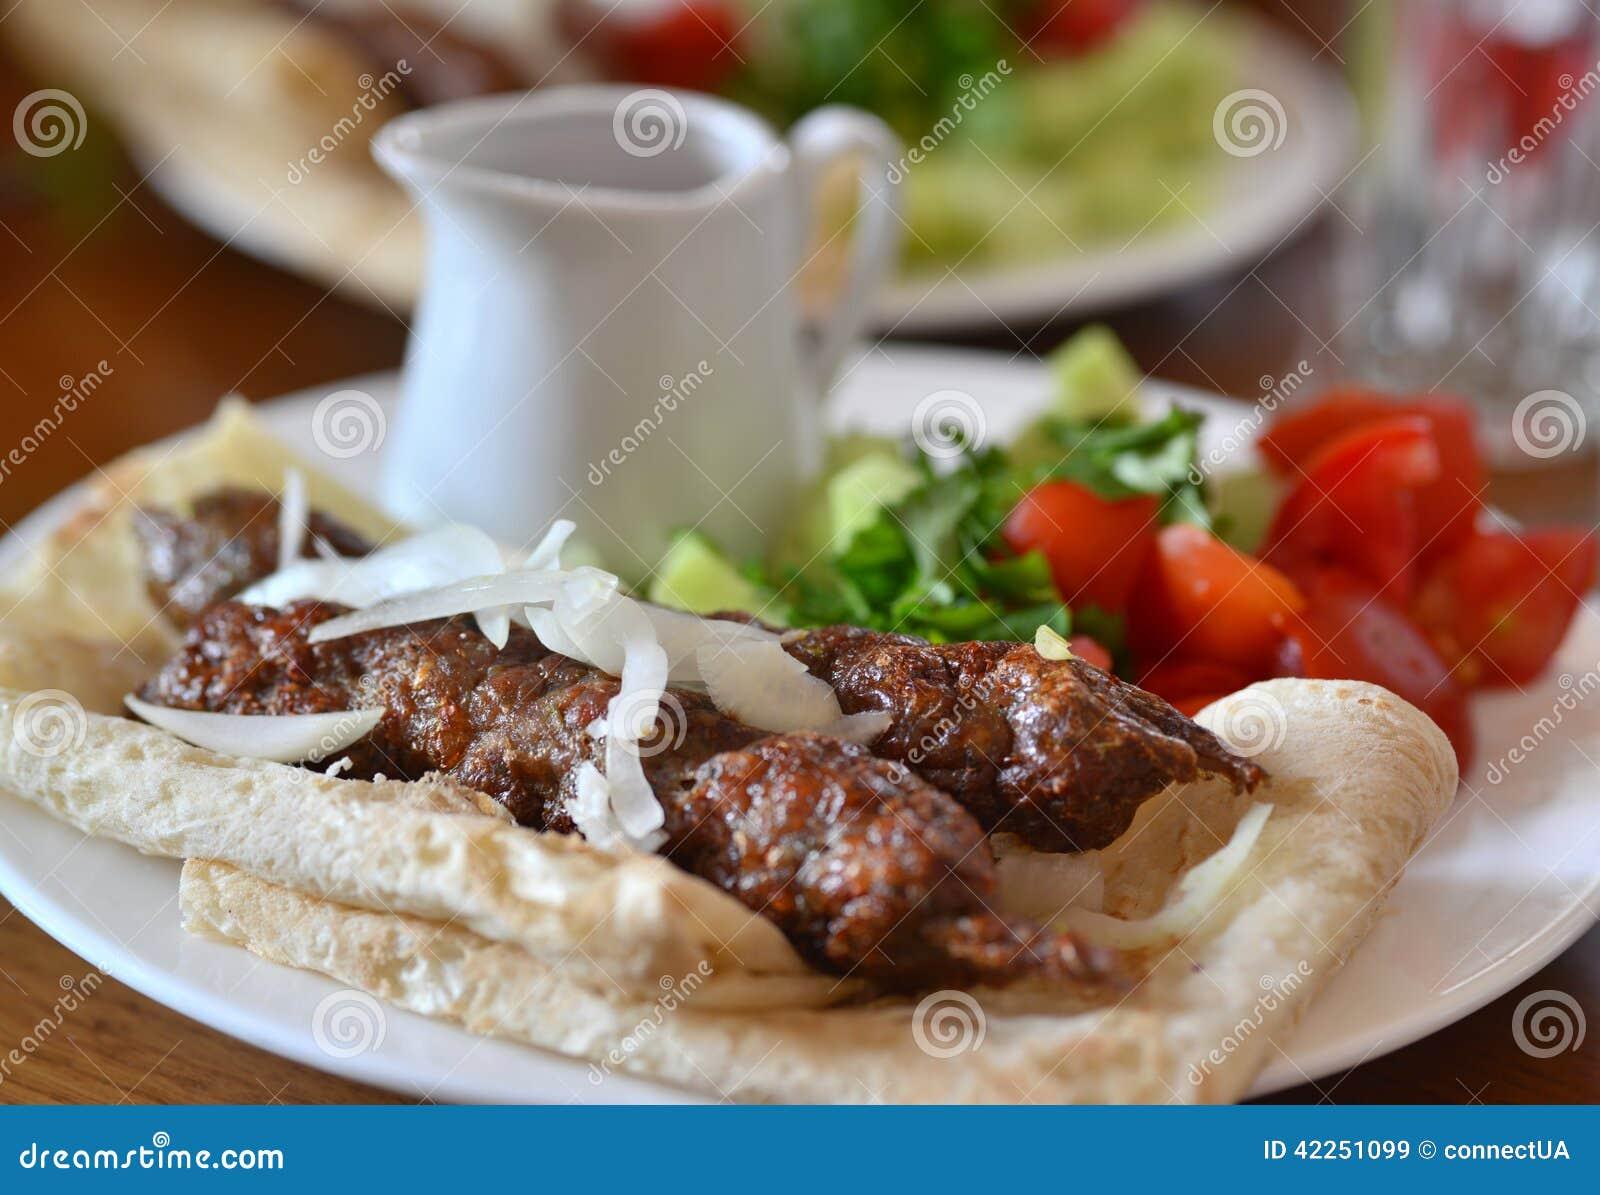 Georgian cuisine - kebab in pita bread